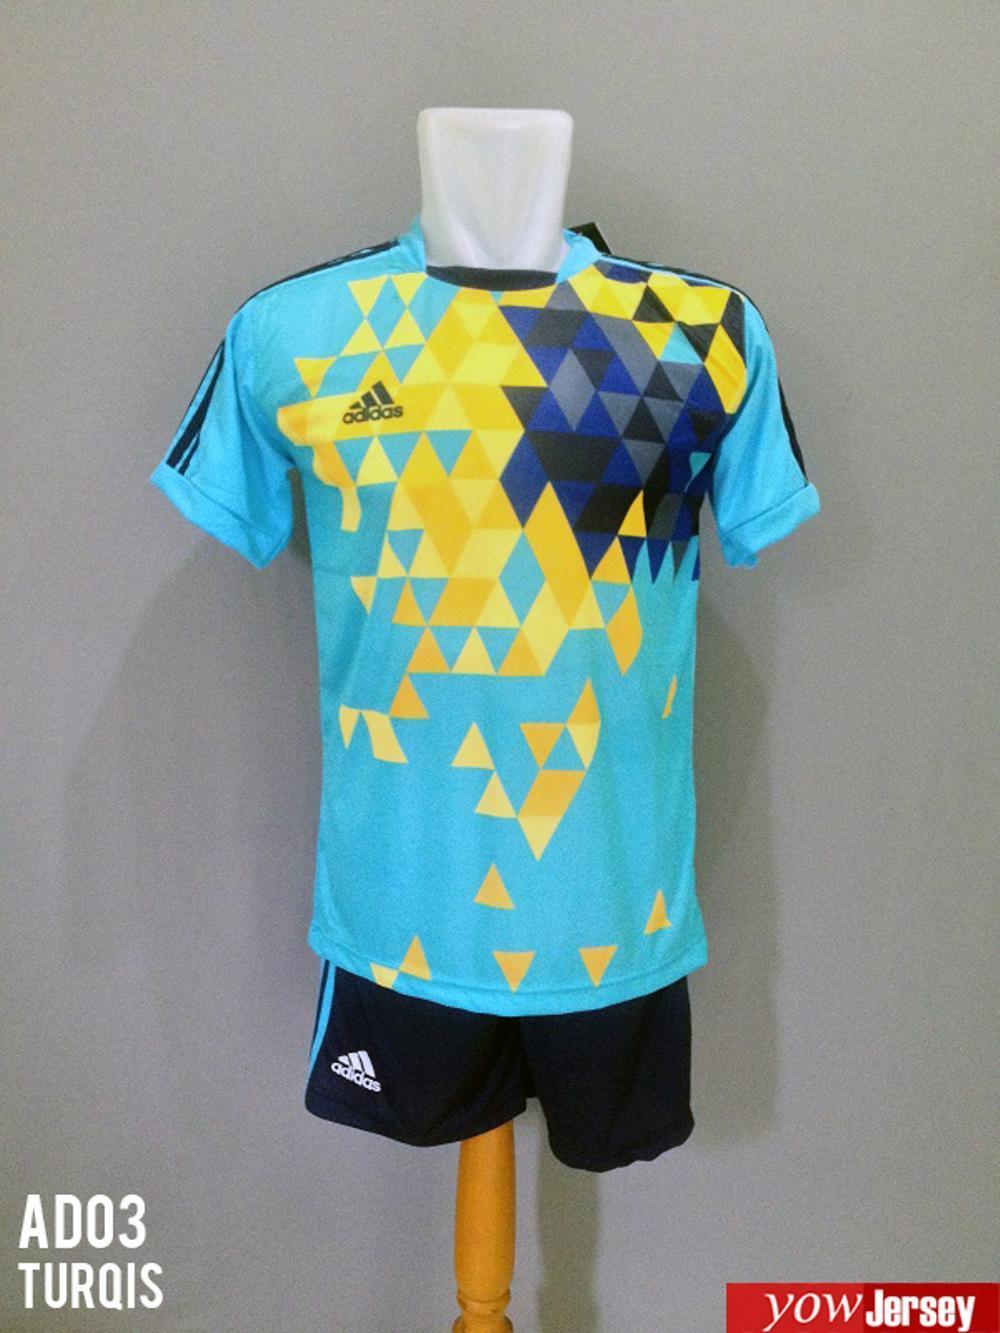 Kelebihan Baru Baju Celana Kaos Setelan Jersey Futsal Ad03 White Sepakbola Nike Nk27 Bola Adidas Turqis